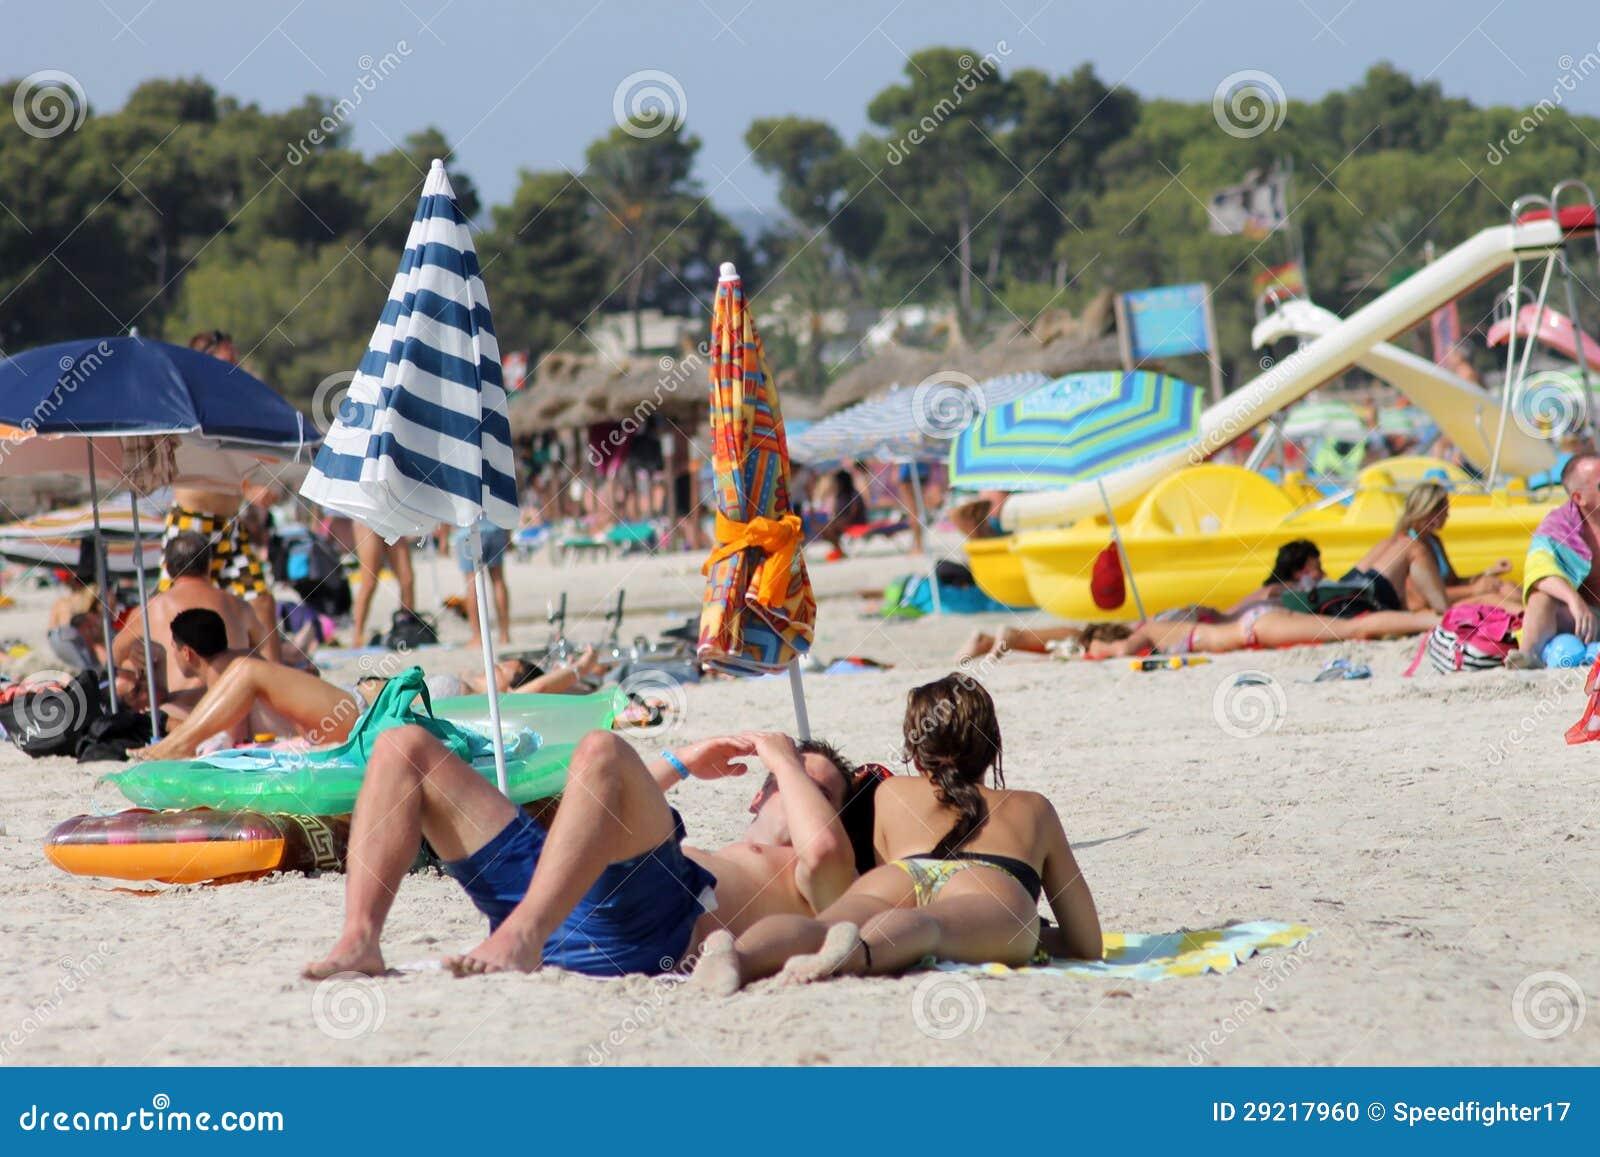 Sunbathers On Spanish Beach